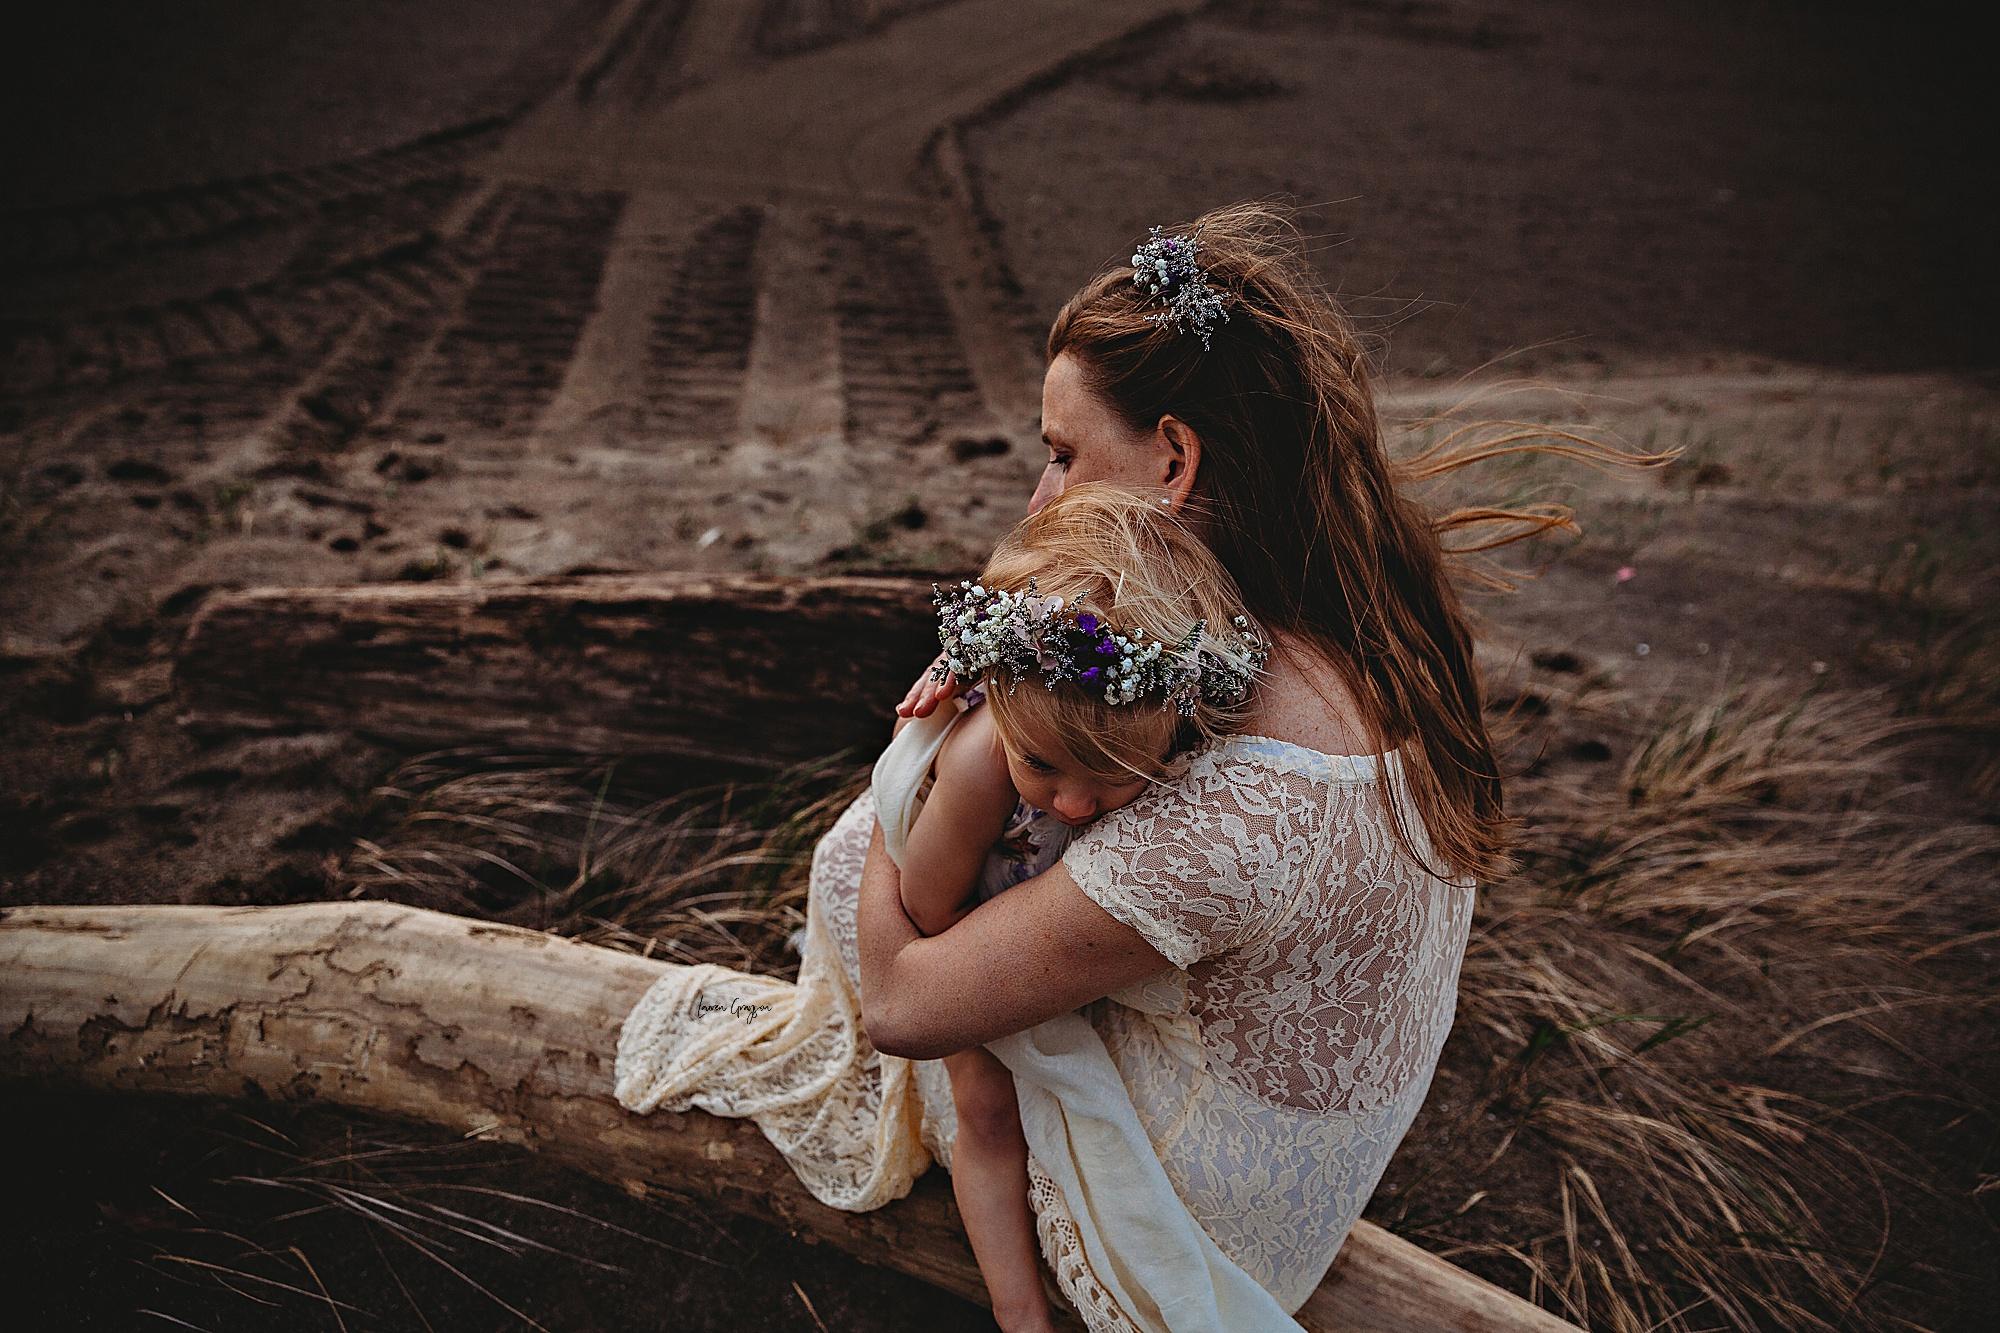 lauren-grayson-photography-mentor-headlands-park-cleveland-ohio-photographer-tiffany-maternity-_0020.jpg